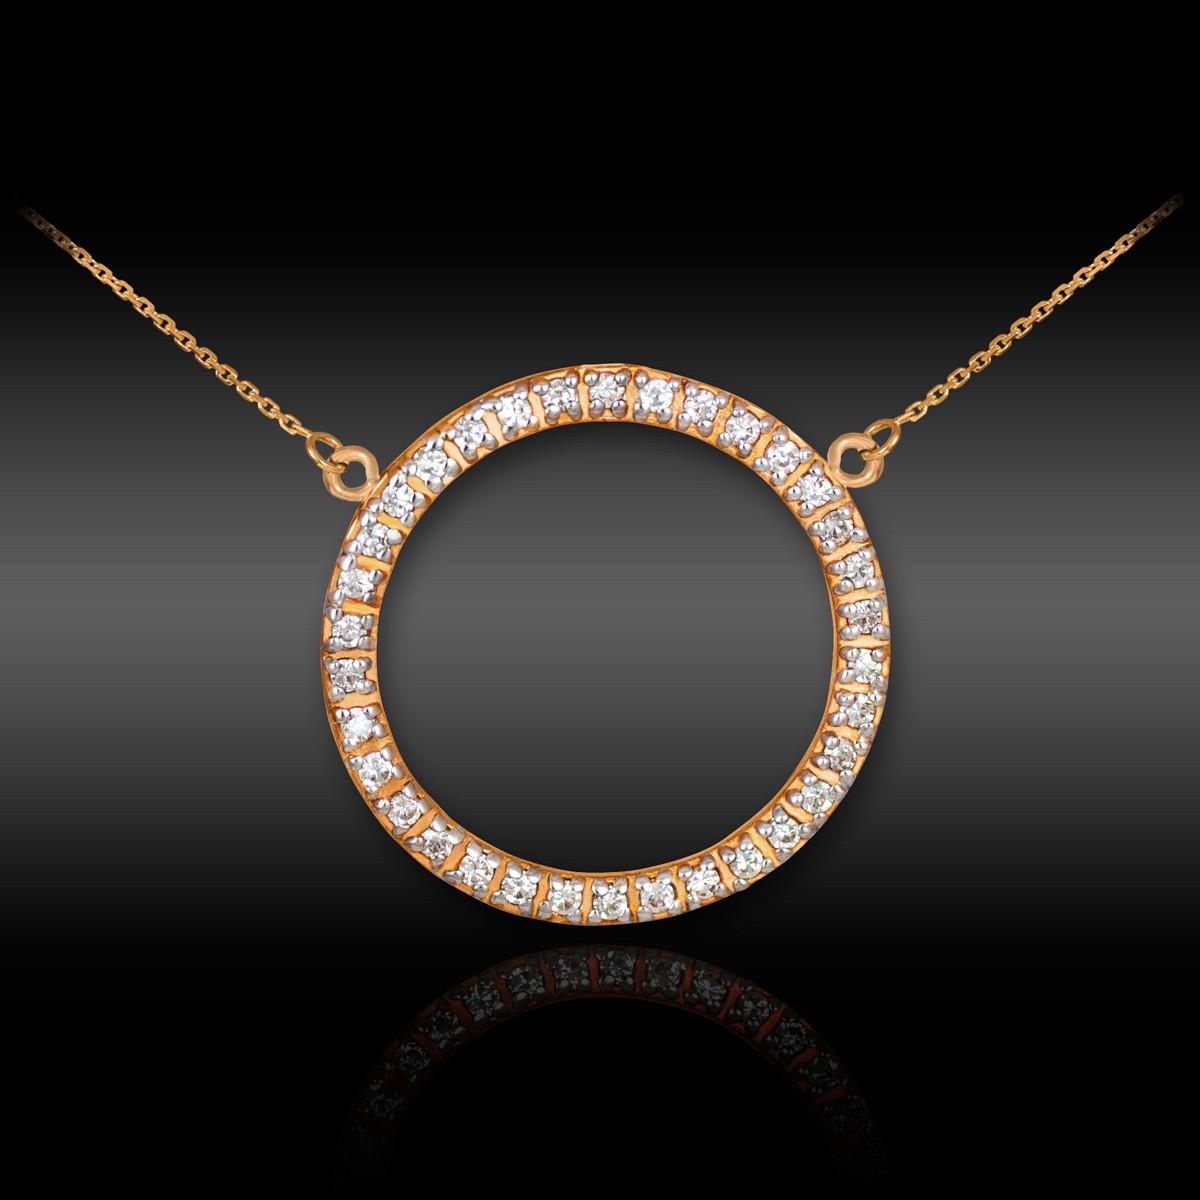 54e6389b4e3 14K Rose Gold Eternity Circle of Life Diamond Karma Ring Necklace. Image 1.  Loading zoom